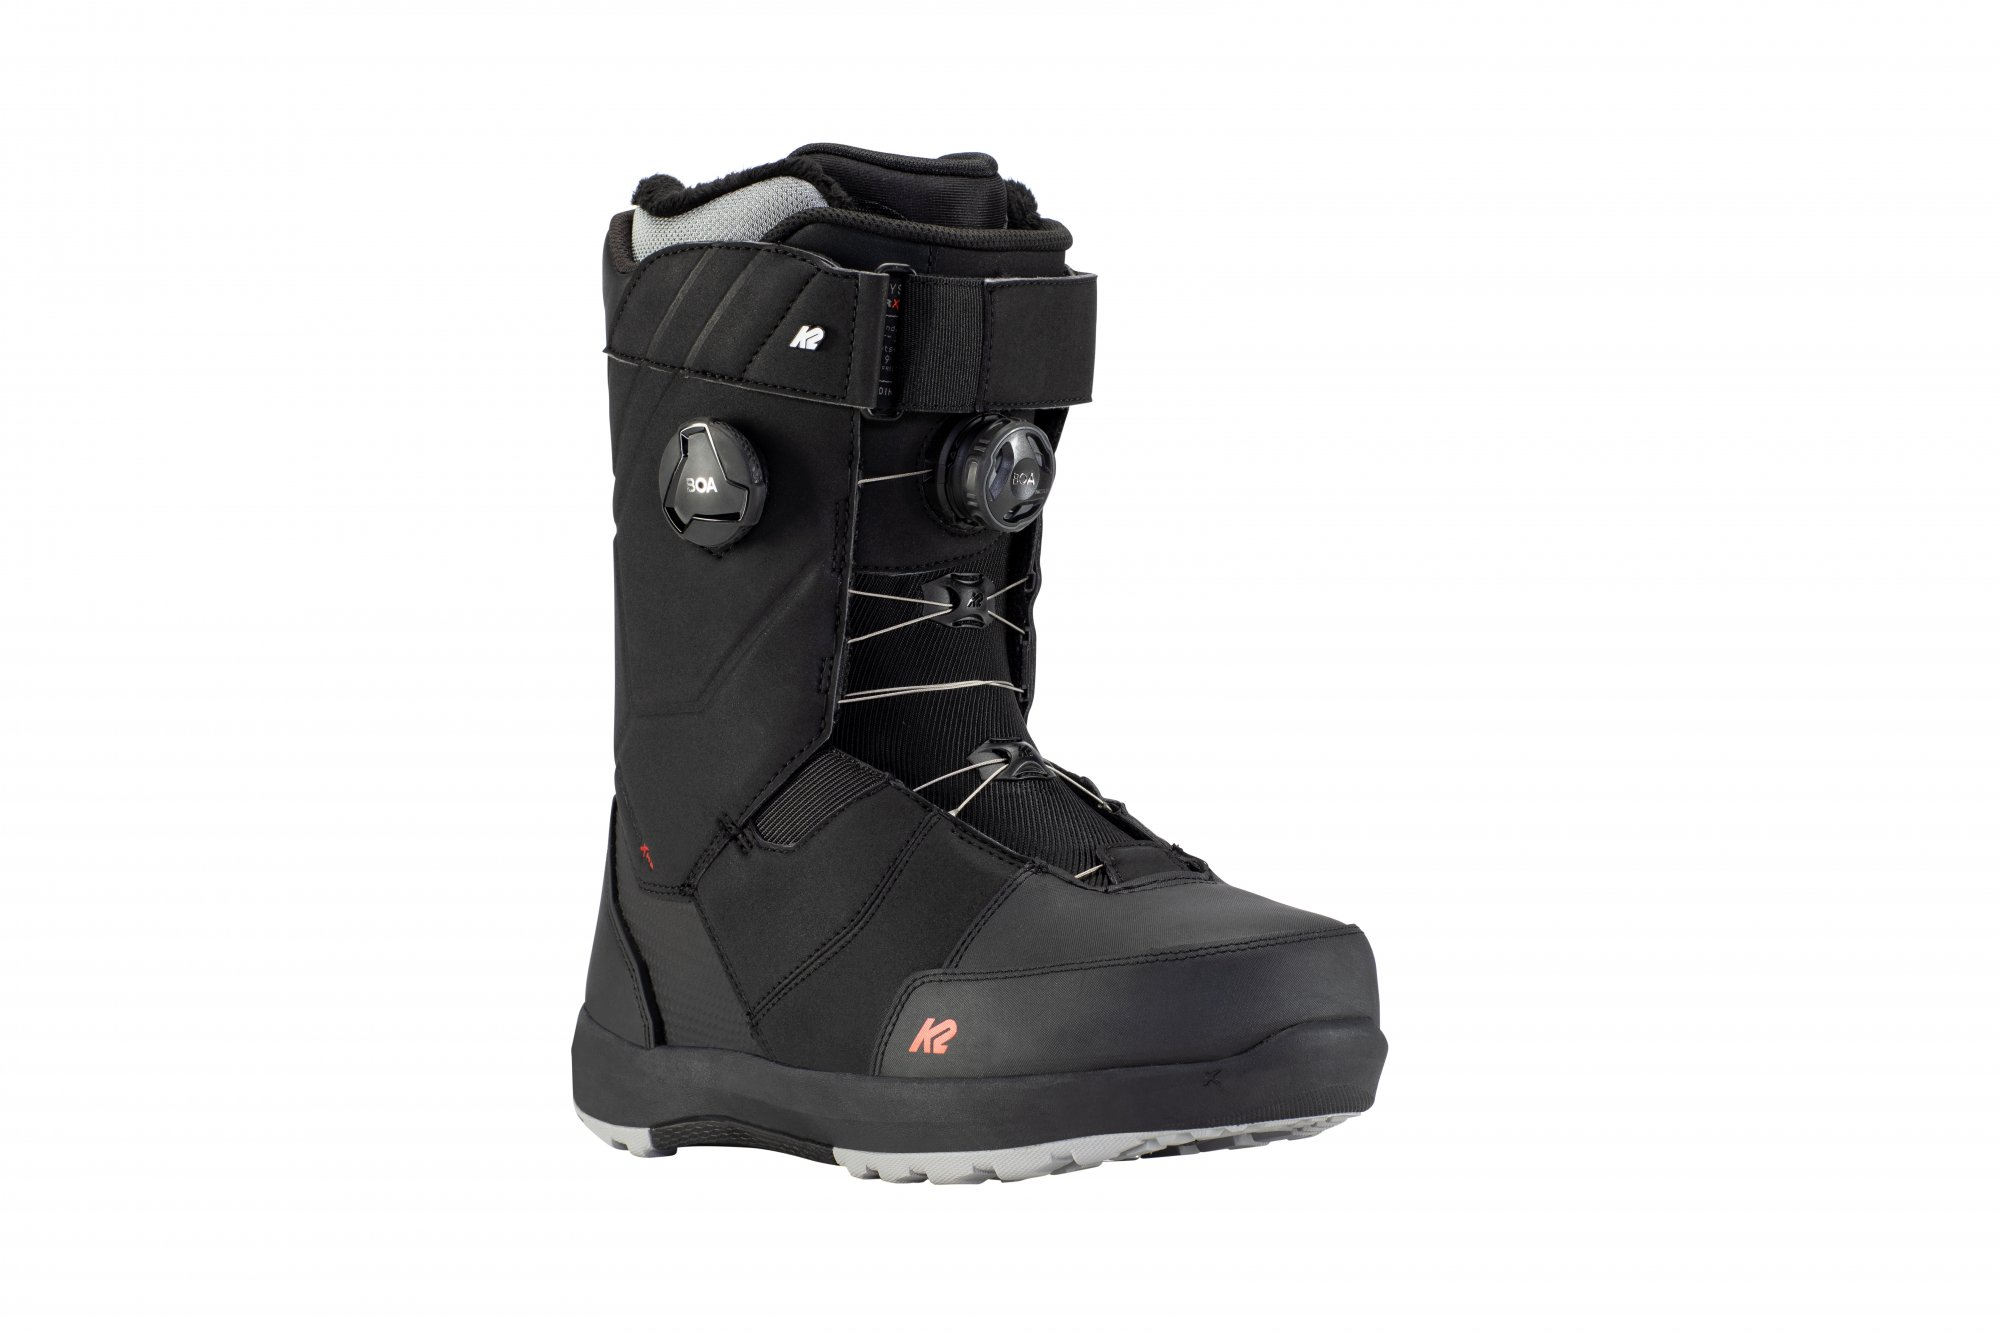 2021 K2 Maysis Clicker X HB Men's Snowboard Boots